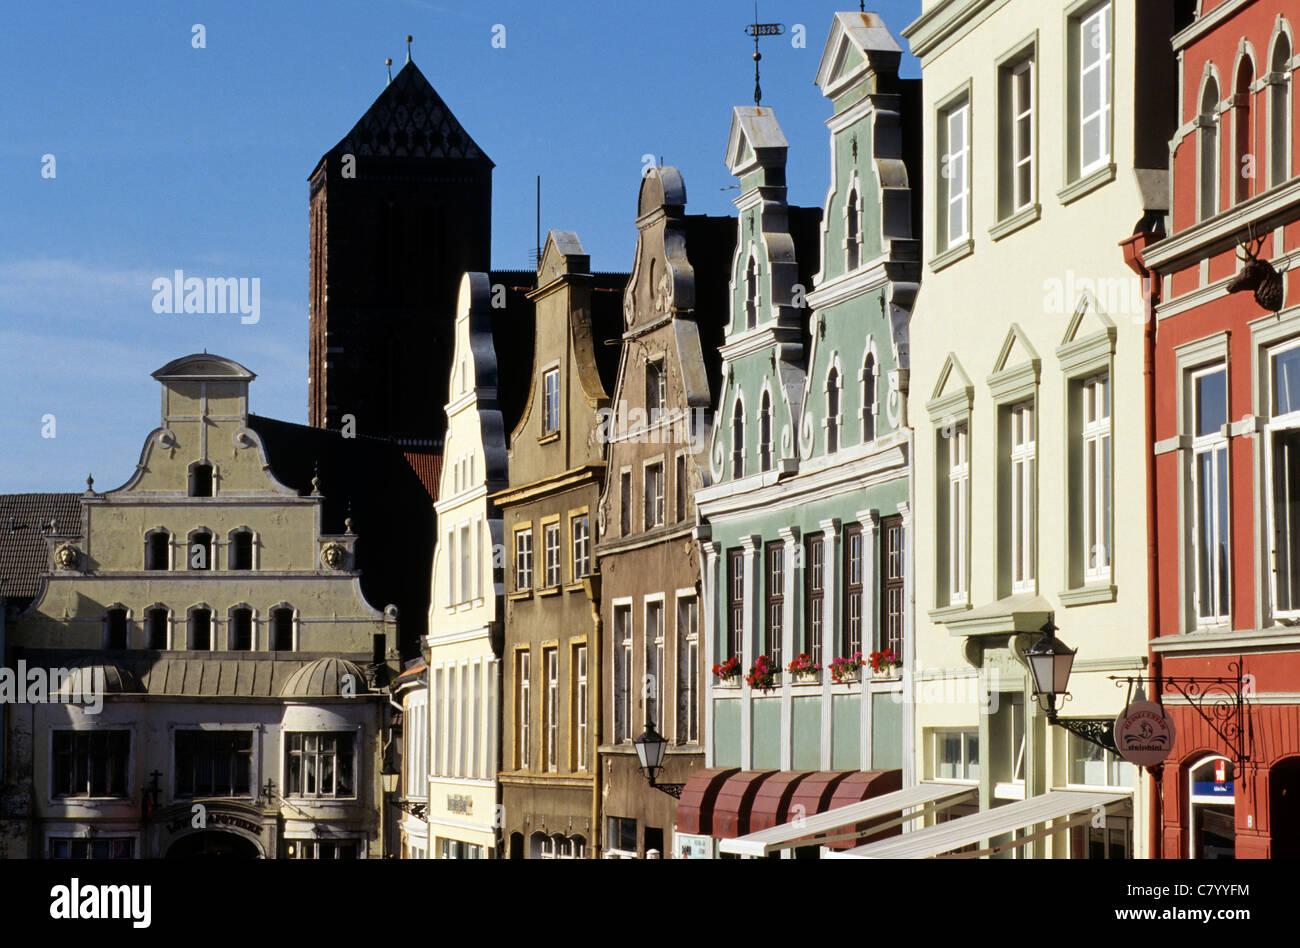 Germany, Mecklenburg-Western Pomerania, Wismar, Kramerstrasse - Stock Image